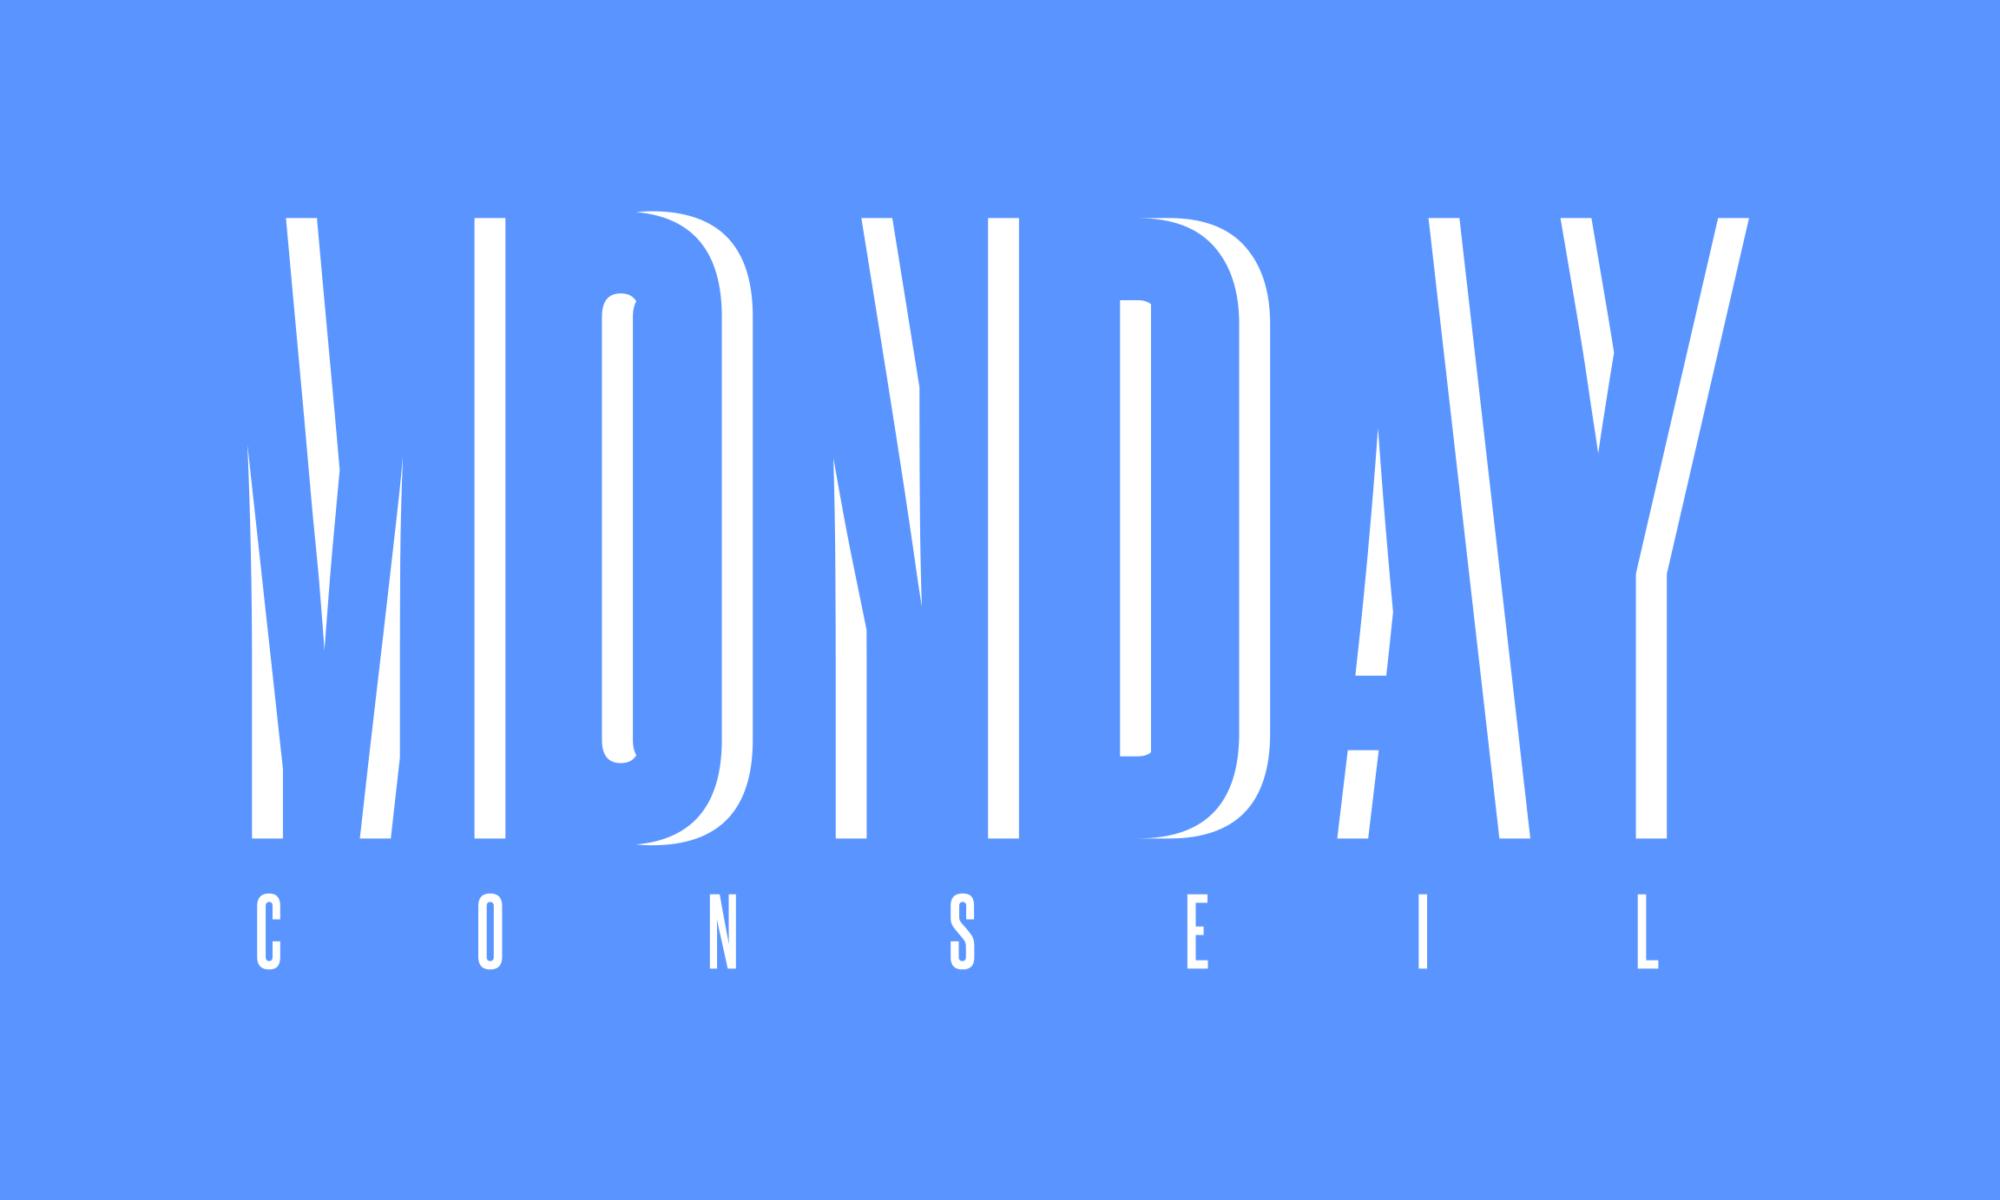 Monday Conseil